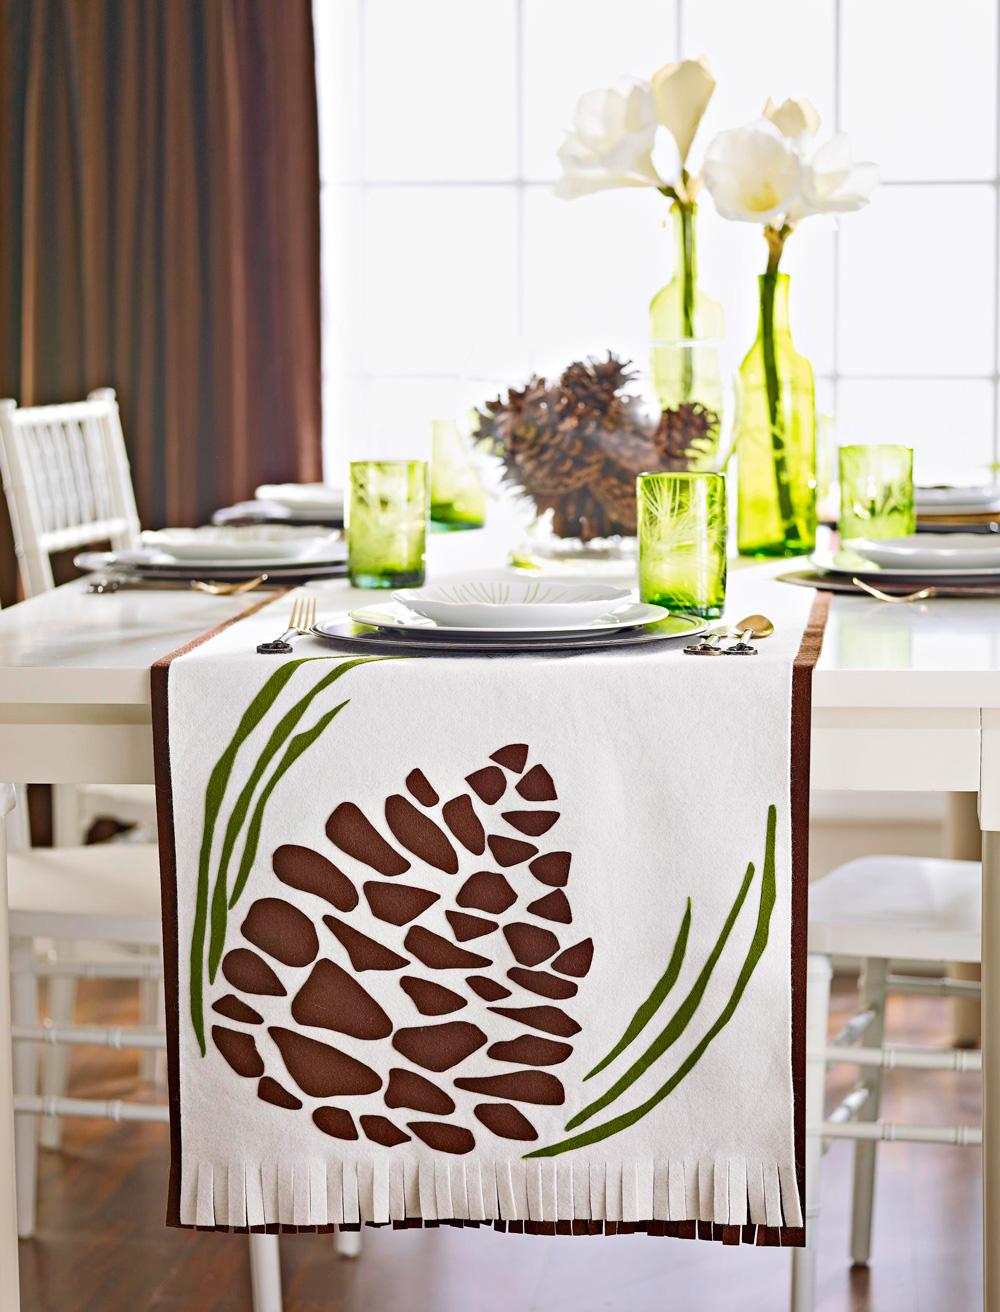 Wintry woods tabletop